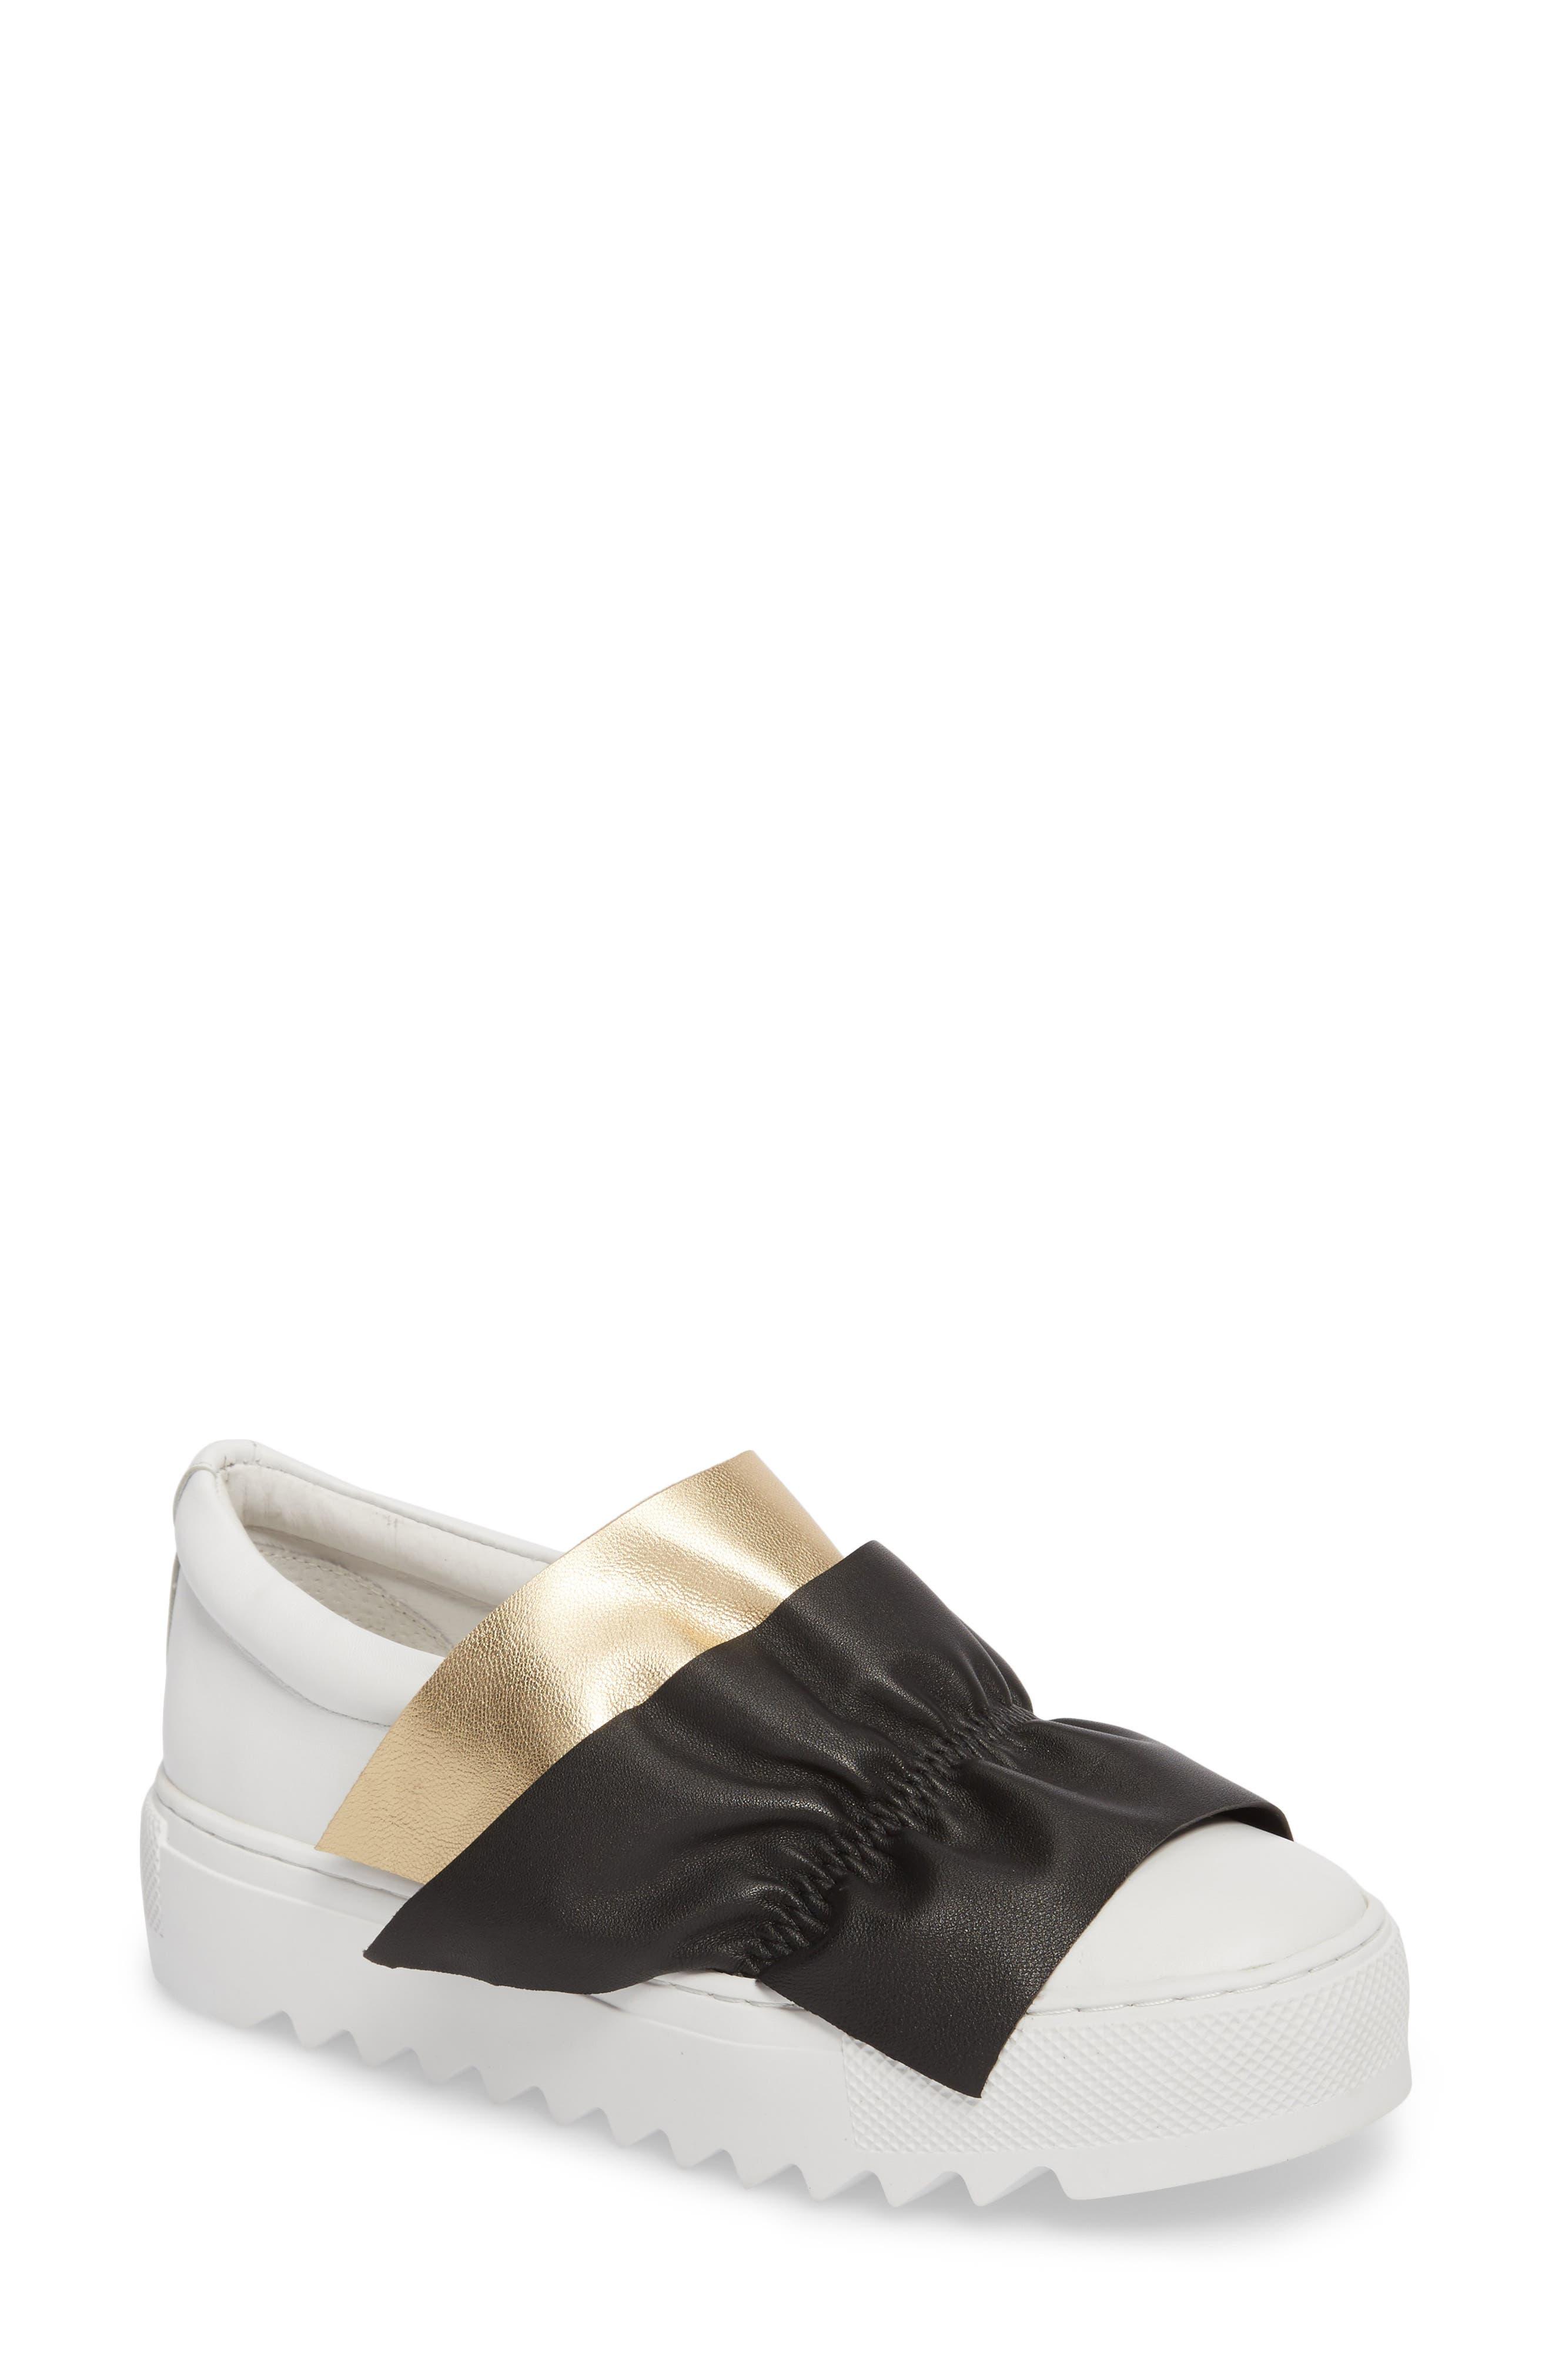 Sadie Ruffle Platform Sneaker,                         Main,                         color, White Leather